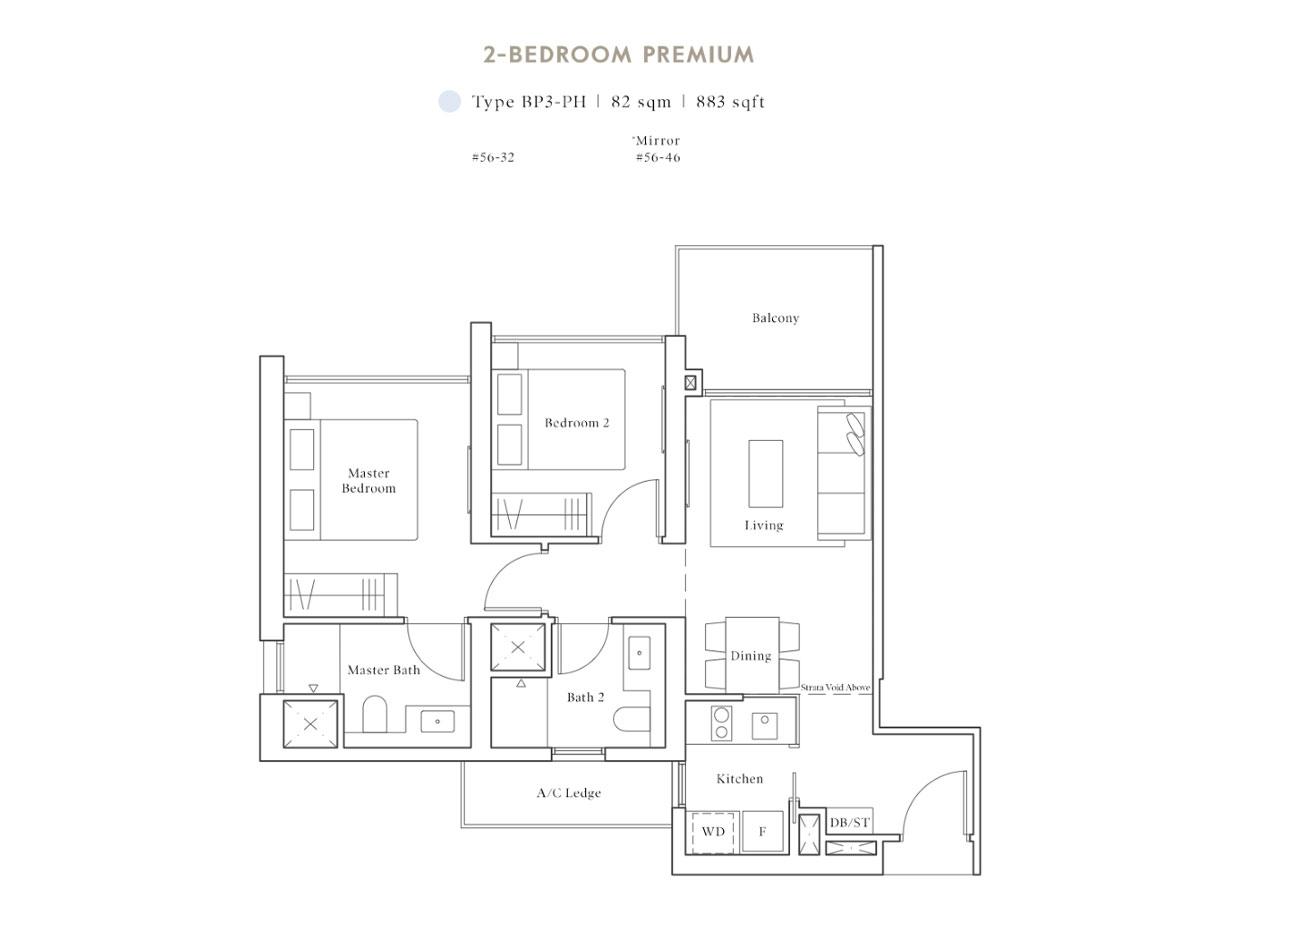 Peak PH Collection - 2 Bedroom Premium, BP3-PH